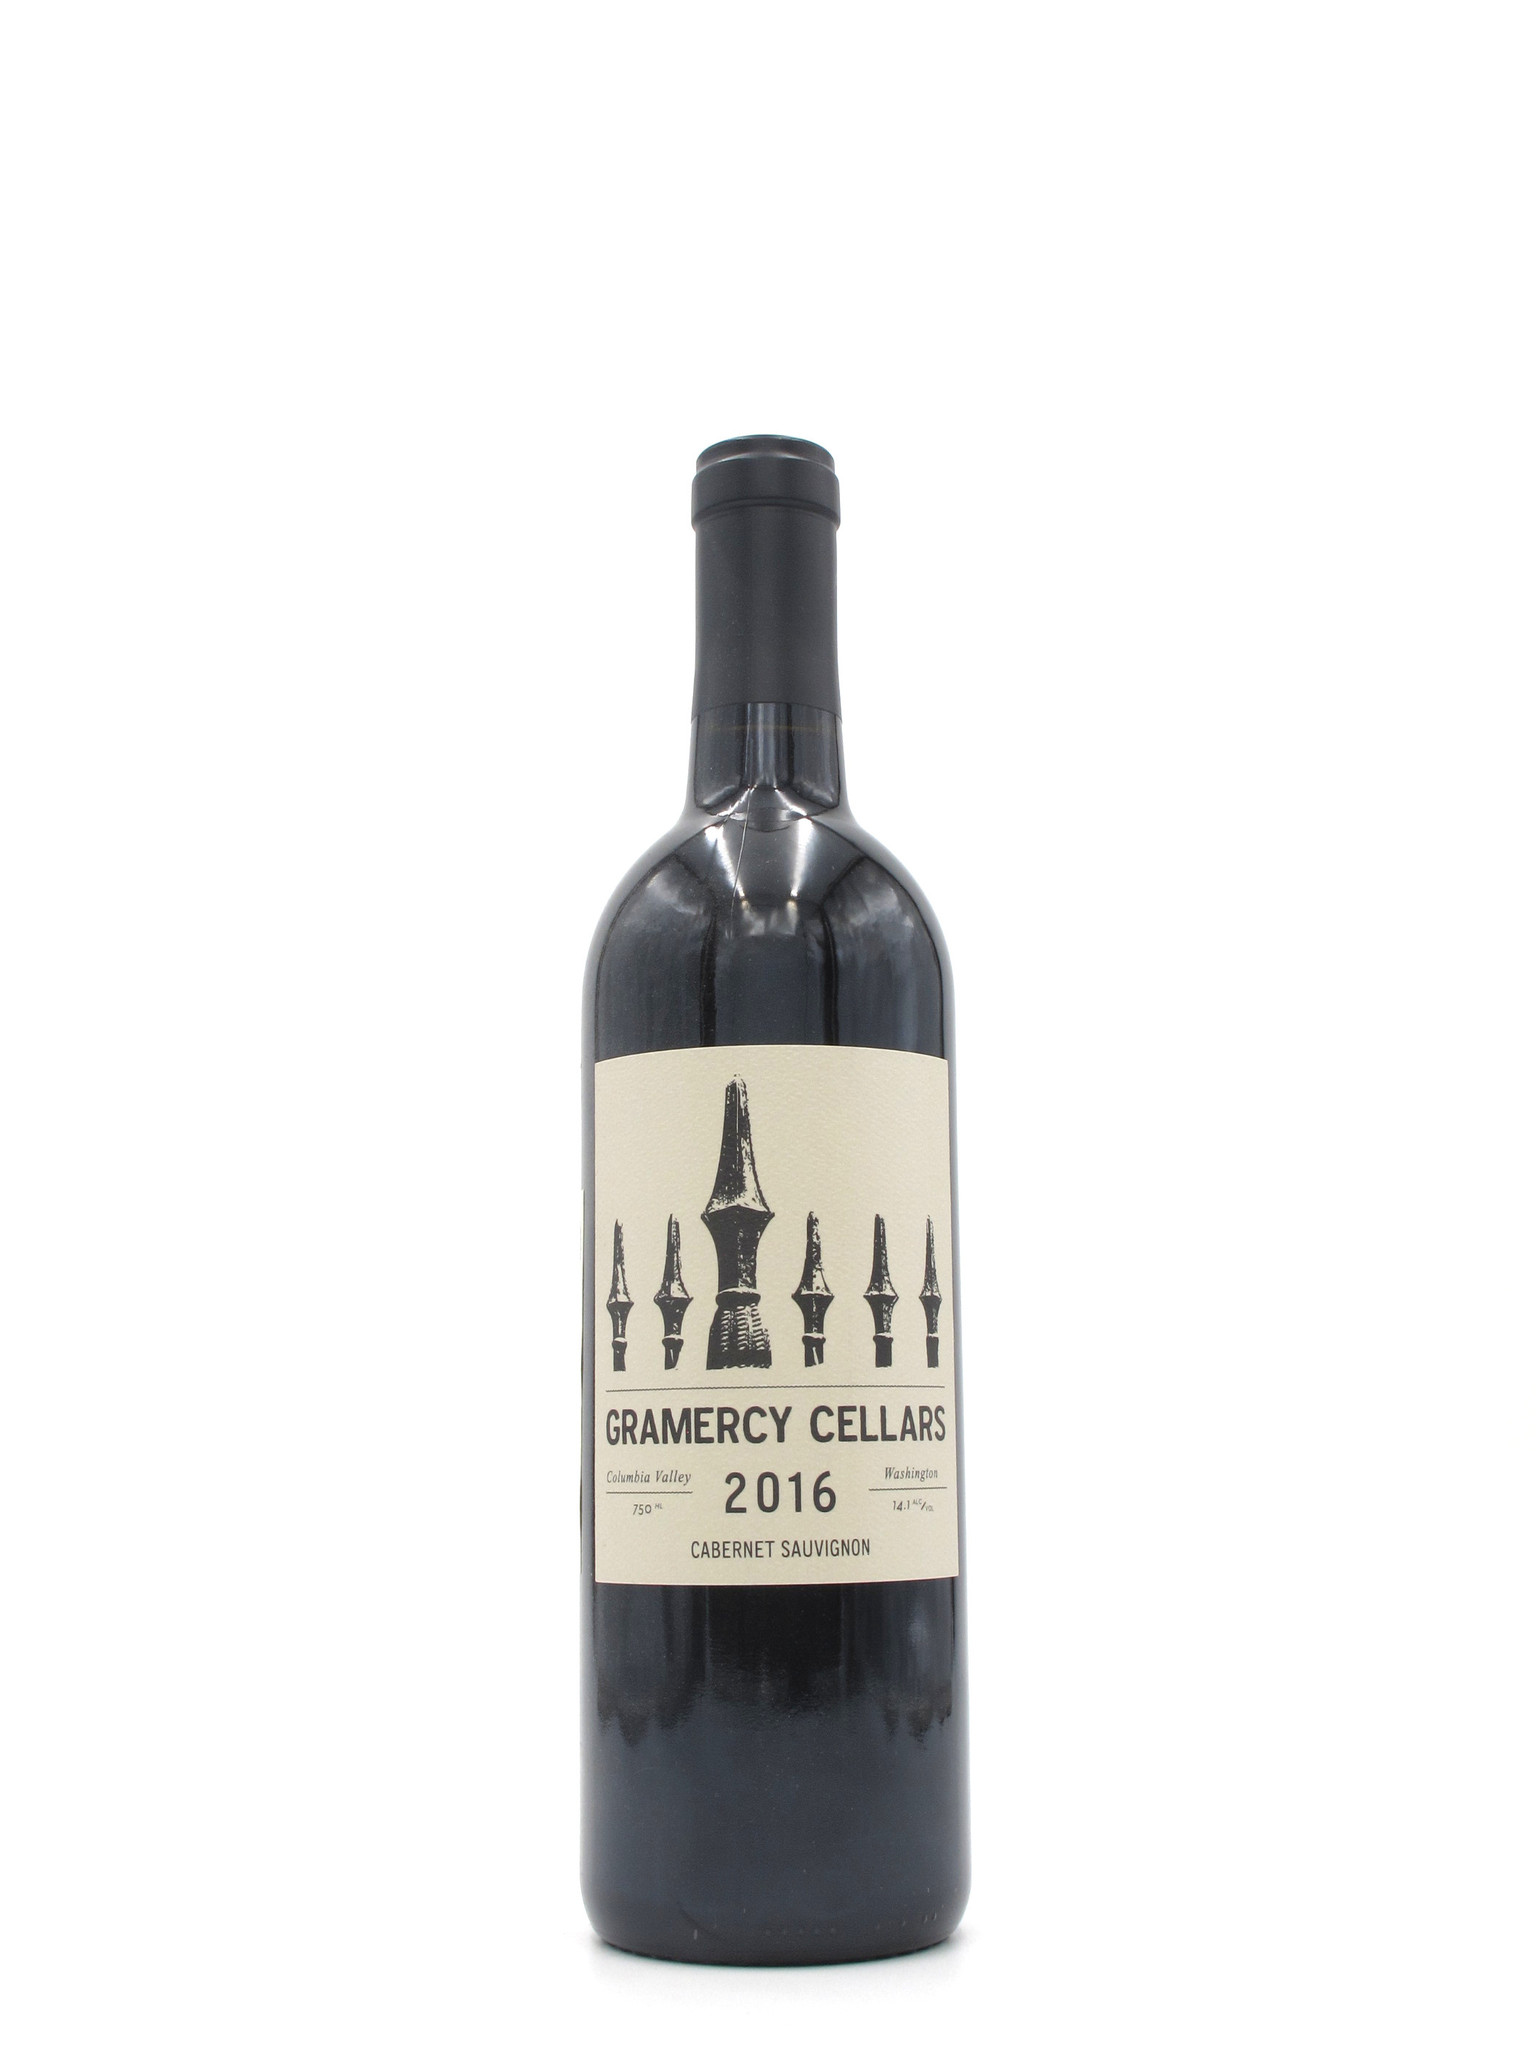 Gramercy Cellars 2016 Gramercy Cellars Cabernet Sauvignon 750ml